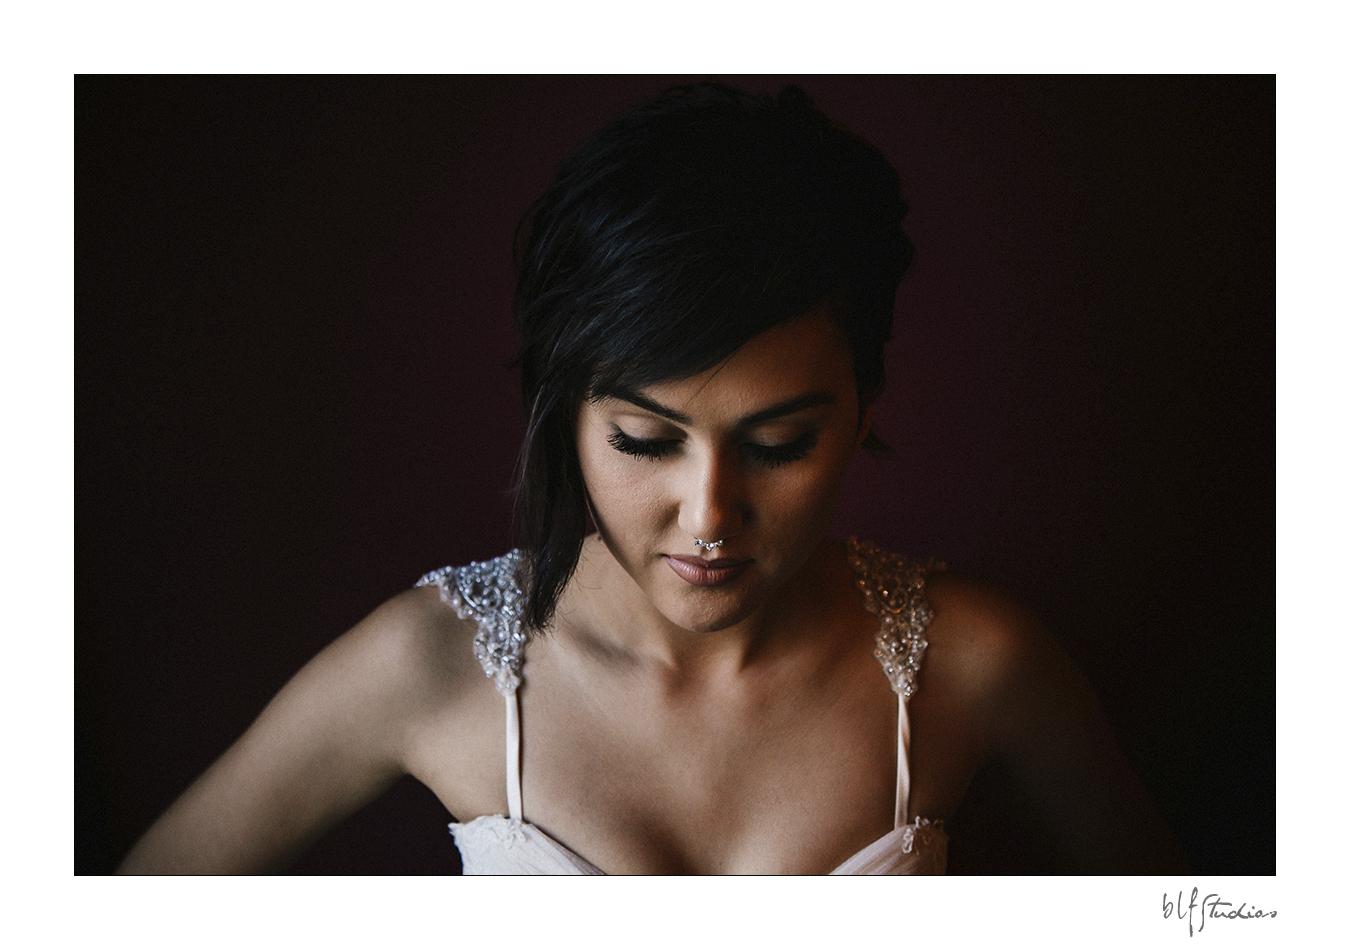 0011-blfstudios-wedding-photographer-daniel-danielle-atlanta.jpg